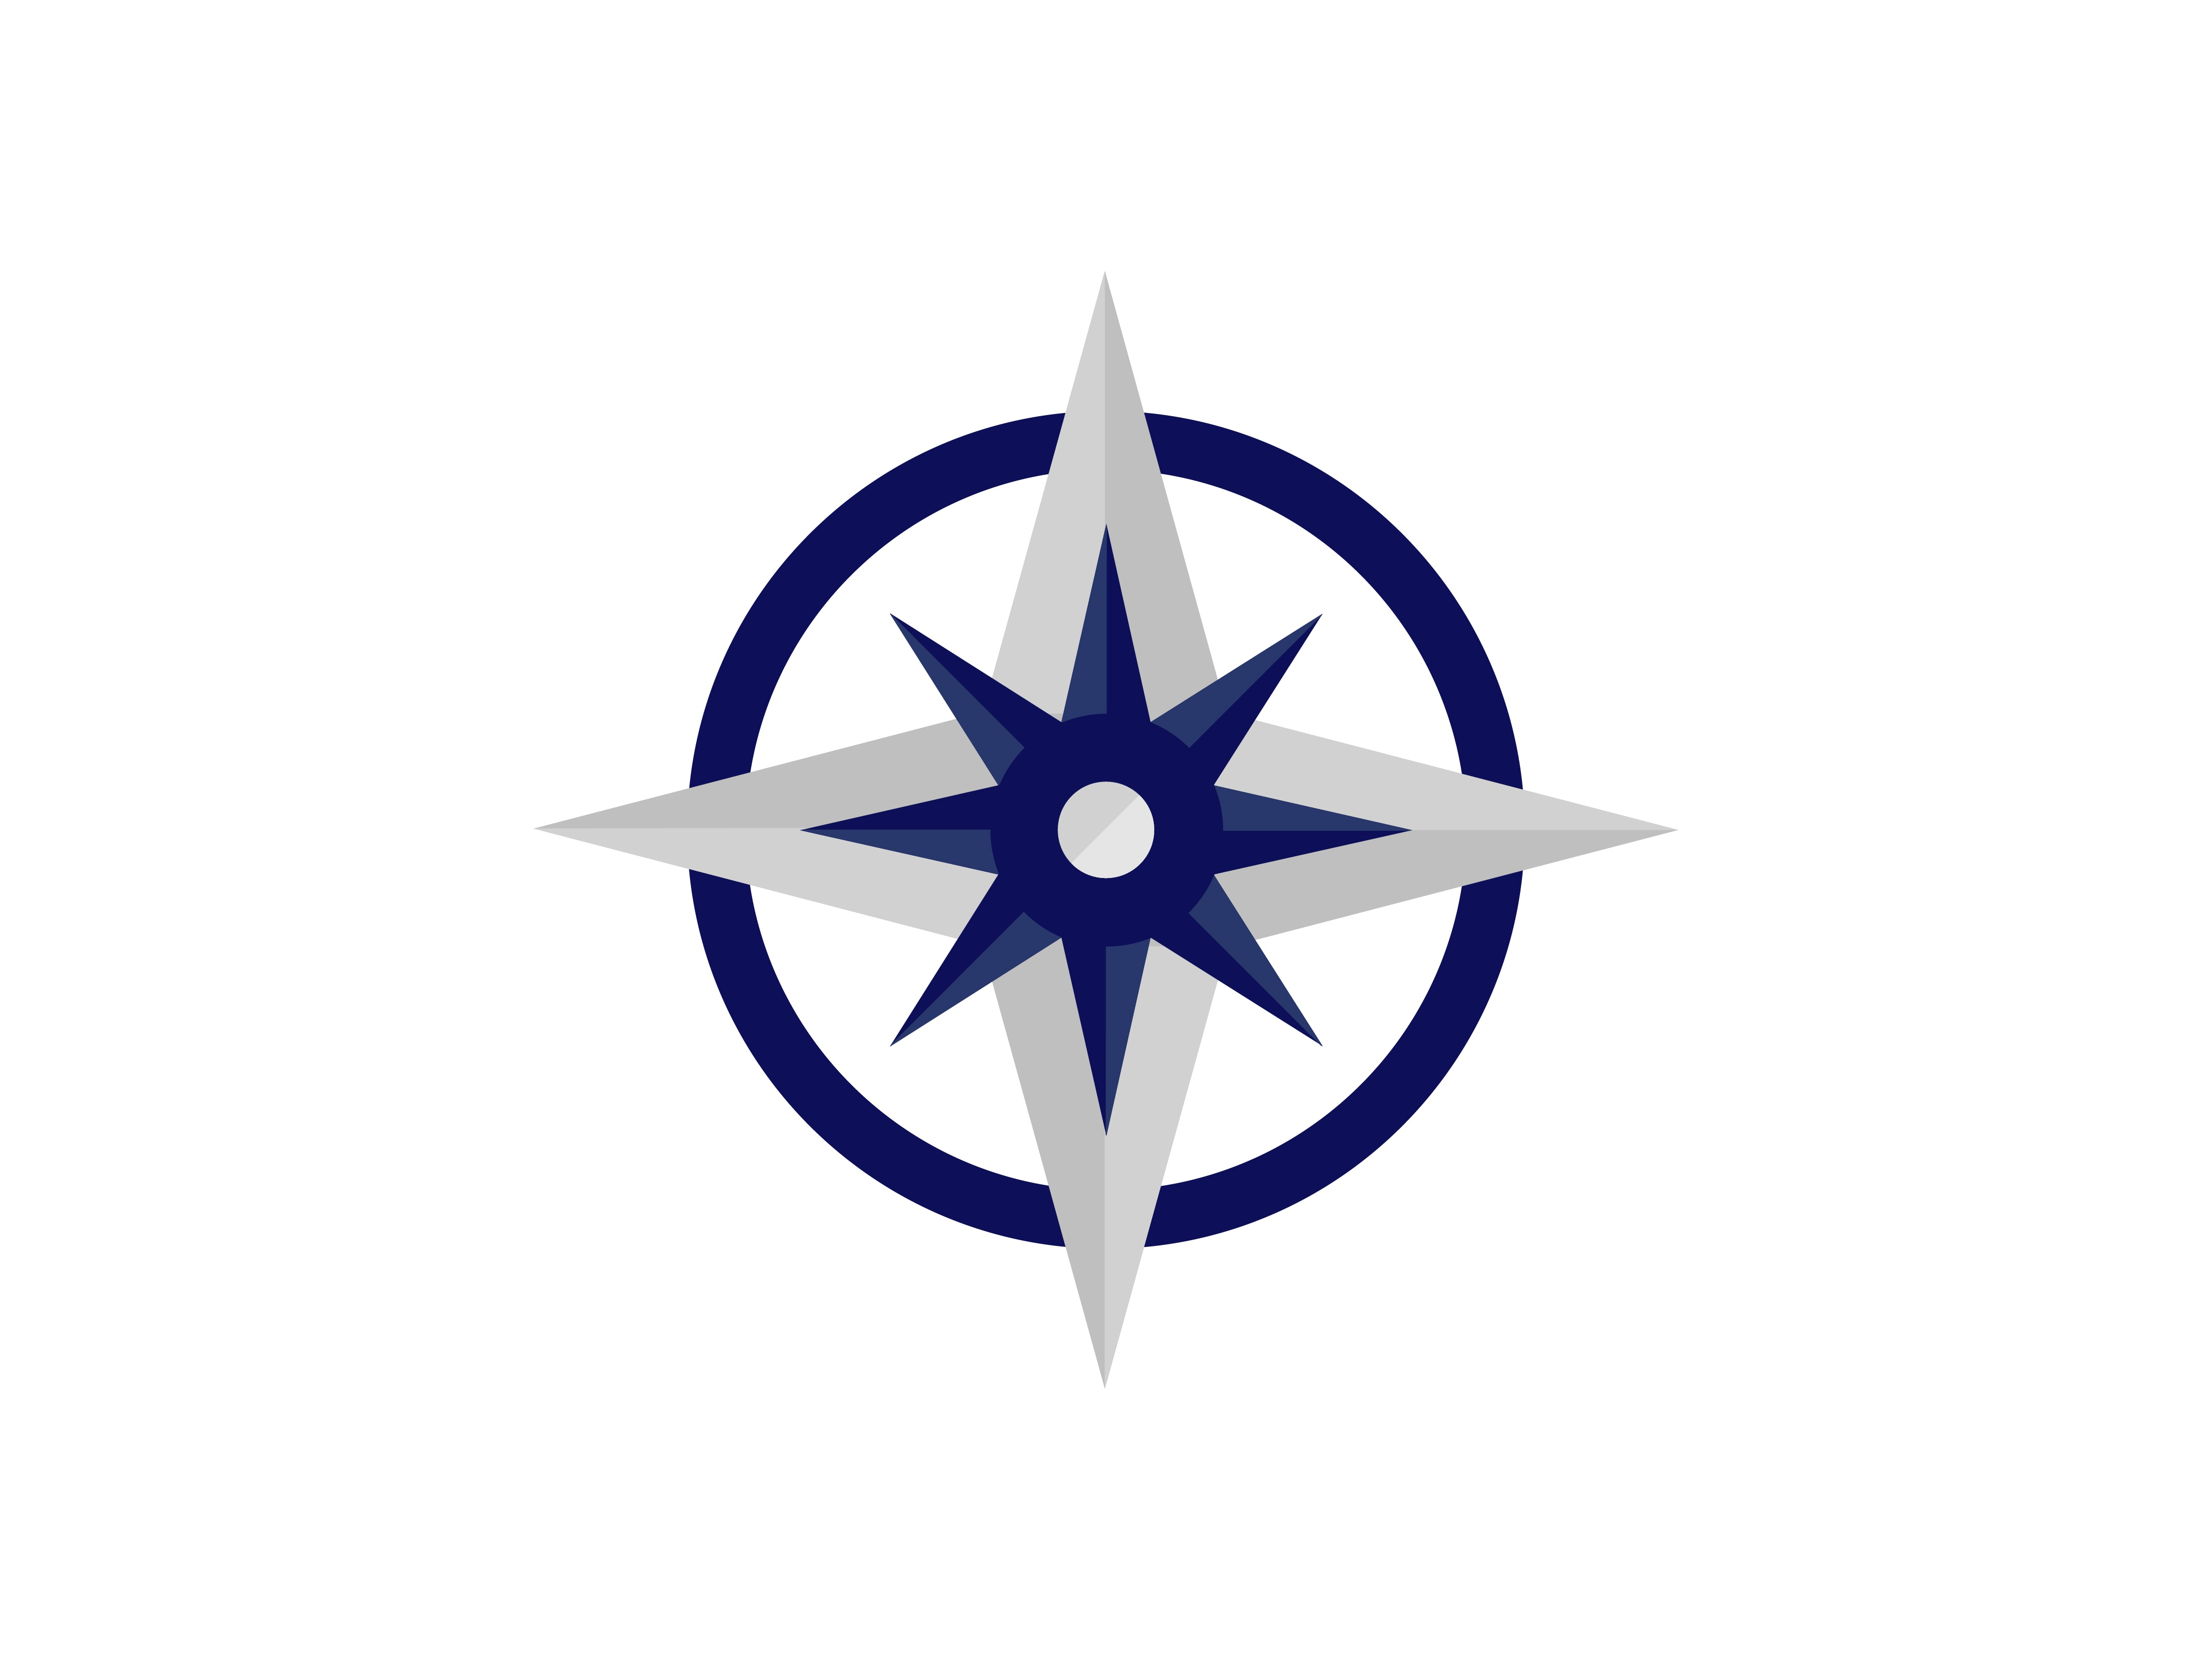 Westone logo full